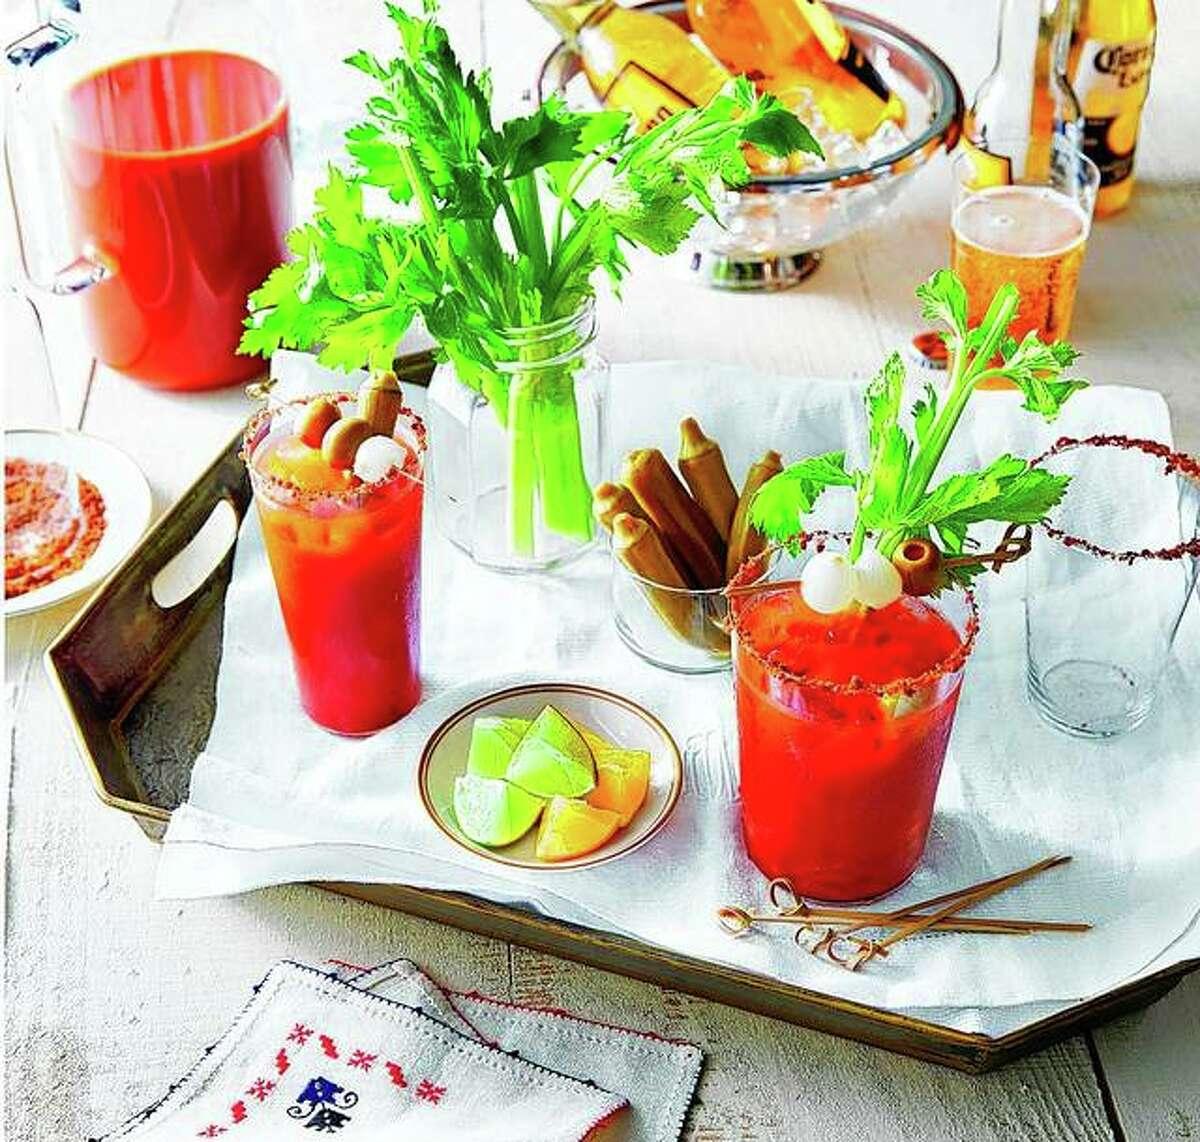 A Bloody Mary bar awaits visitors.